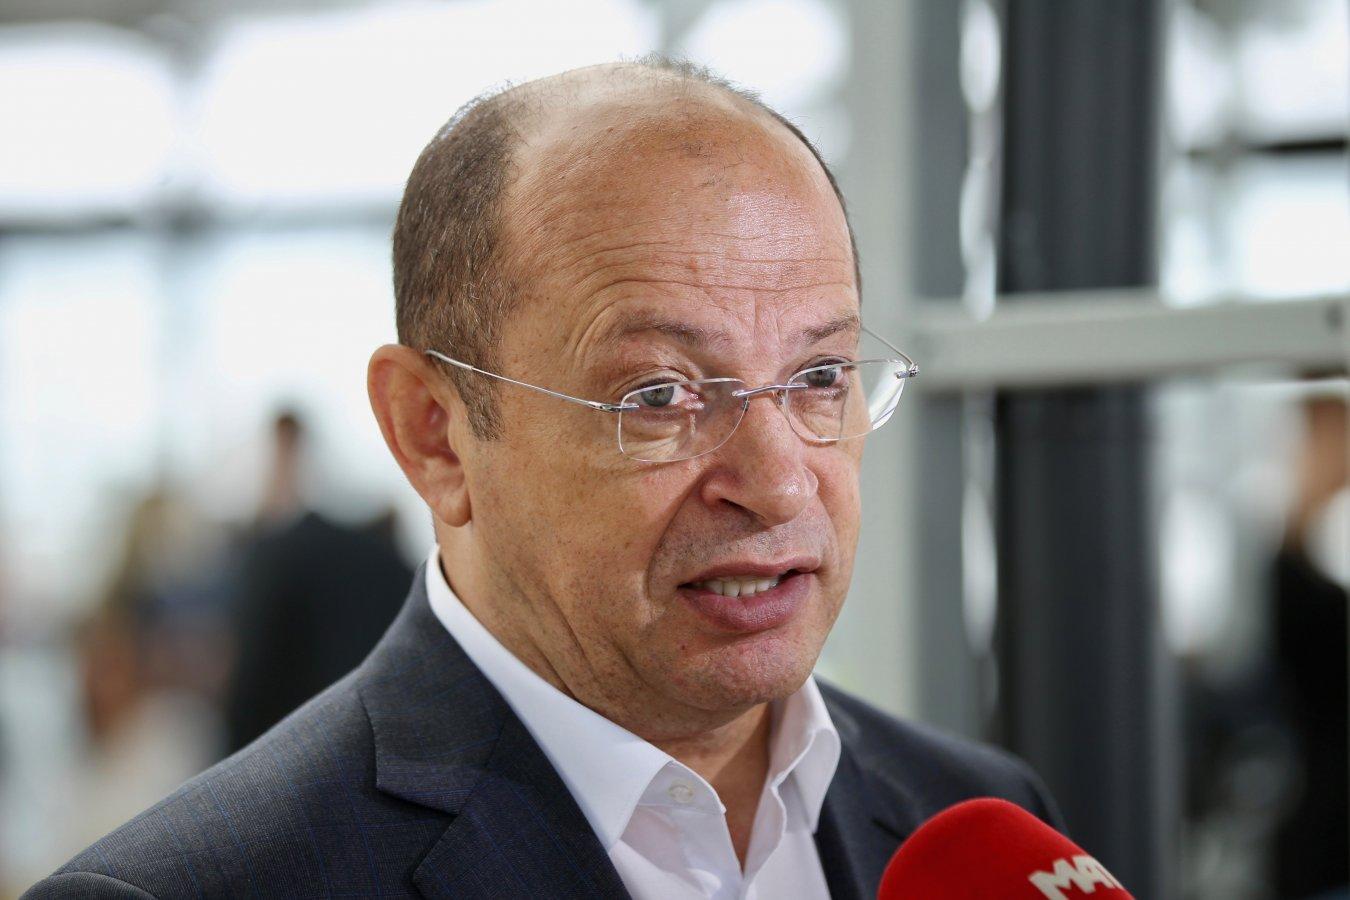 Президент РПЛ: большинство клубов – за отмену лимита на легионеров